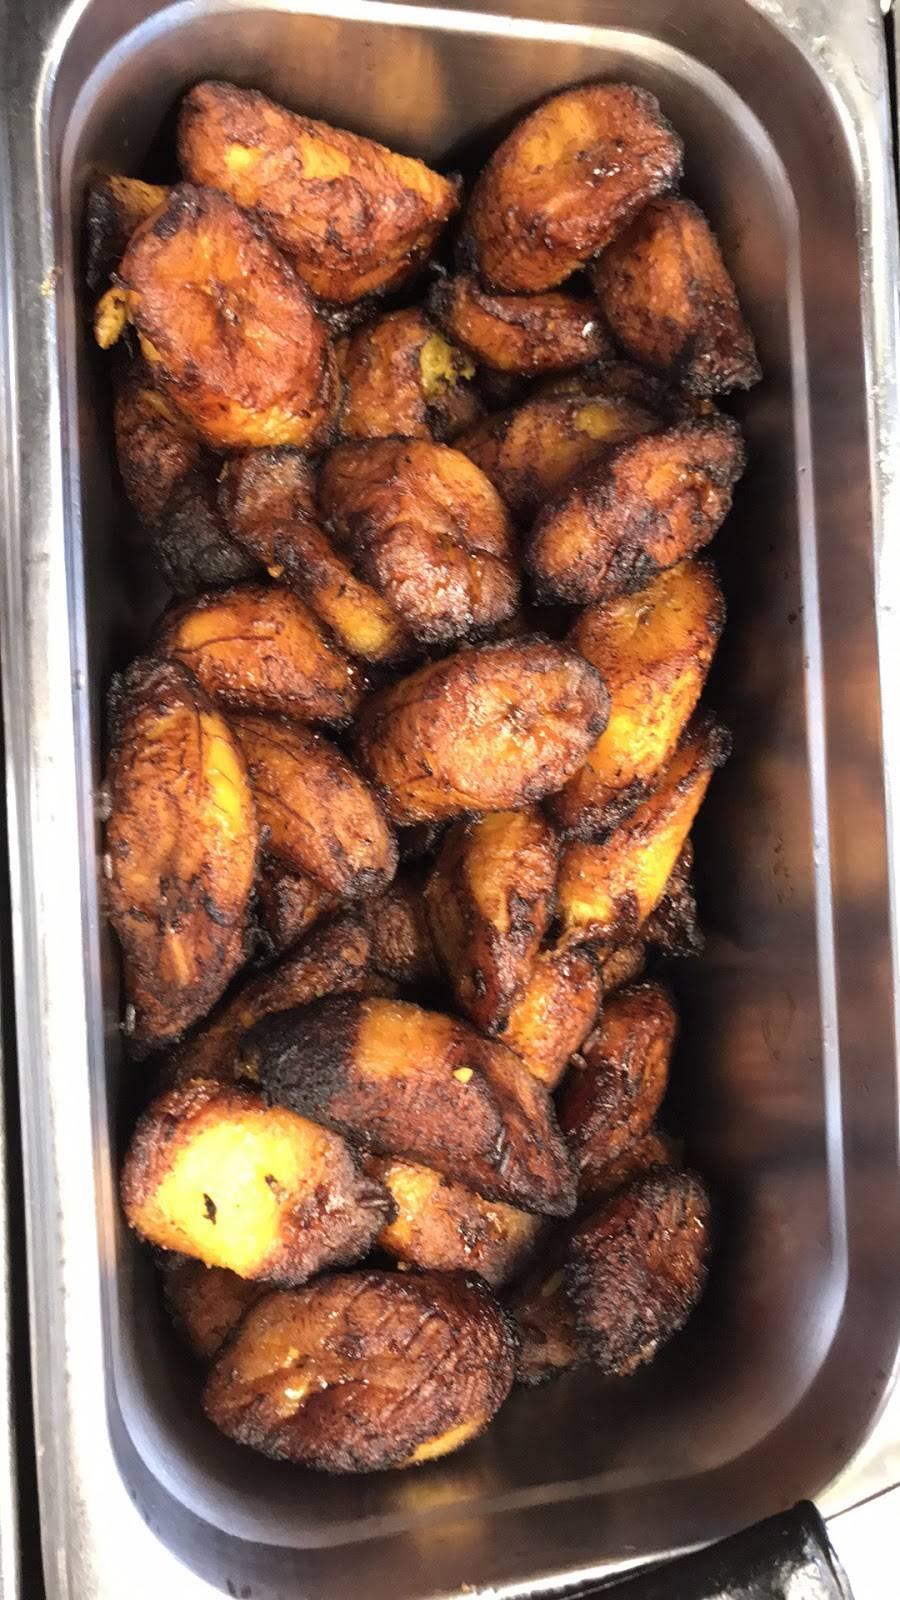 Santa Barbara Cafe/ Santa Barbara Cuban cuisines inc | restaurant | 5570 19th Ct SW #1, Naples, FL 34116, USA | 2392345705 OR +1 239-234-5705